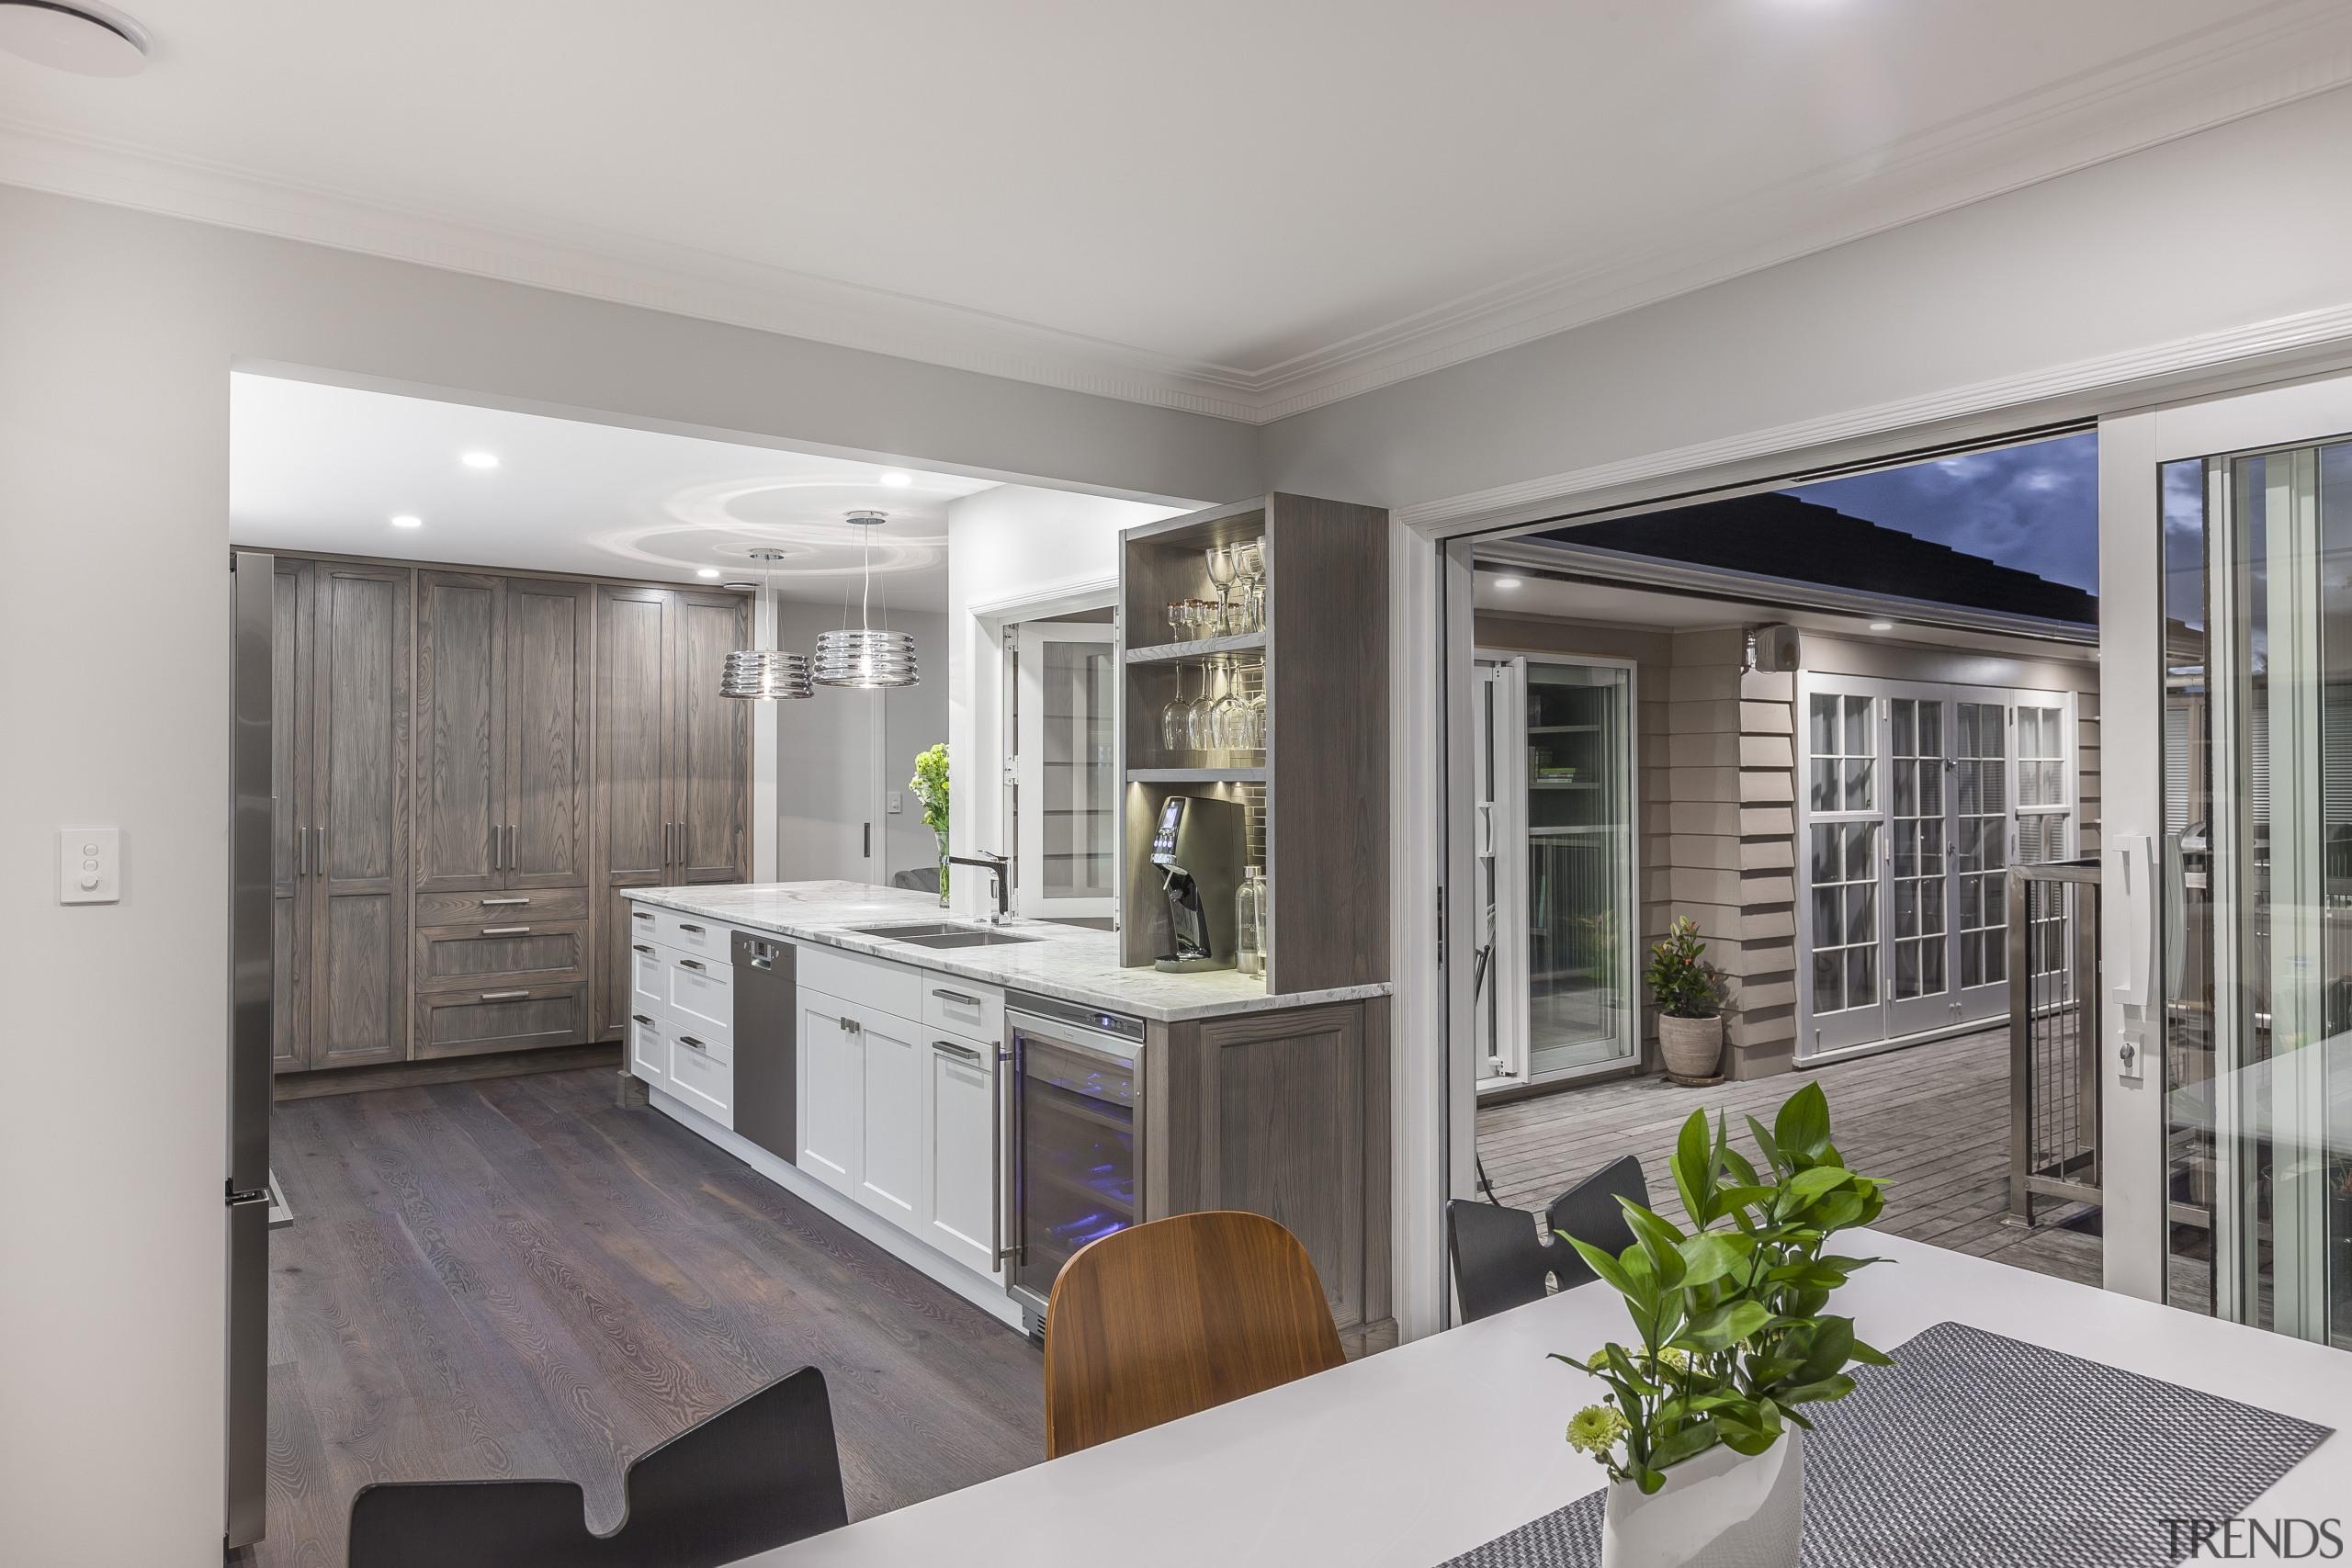 Sunnyhills II - house | interior design | house, interior design, kitchen, property, real estate, window, gray